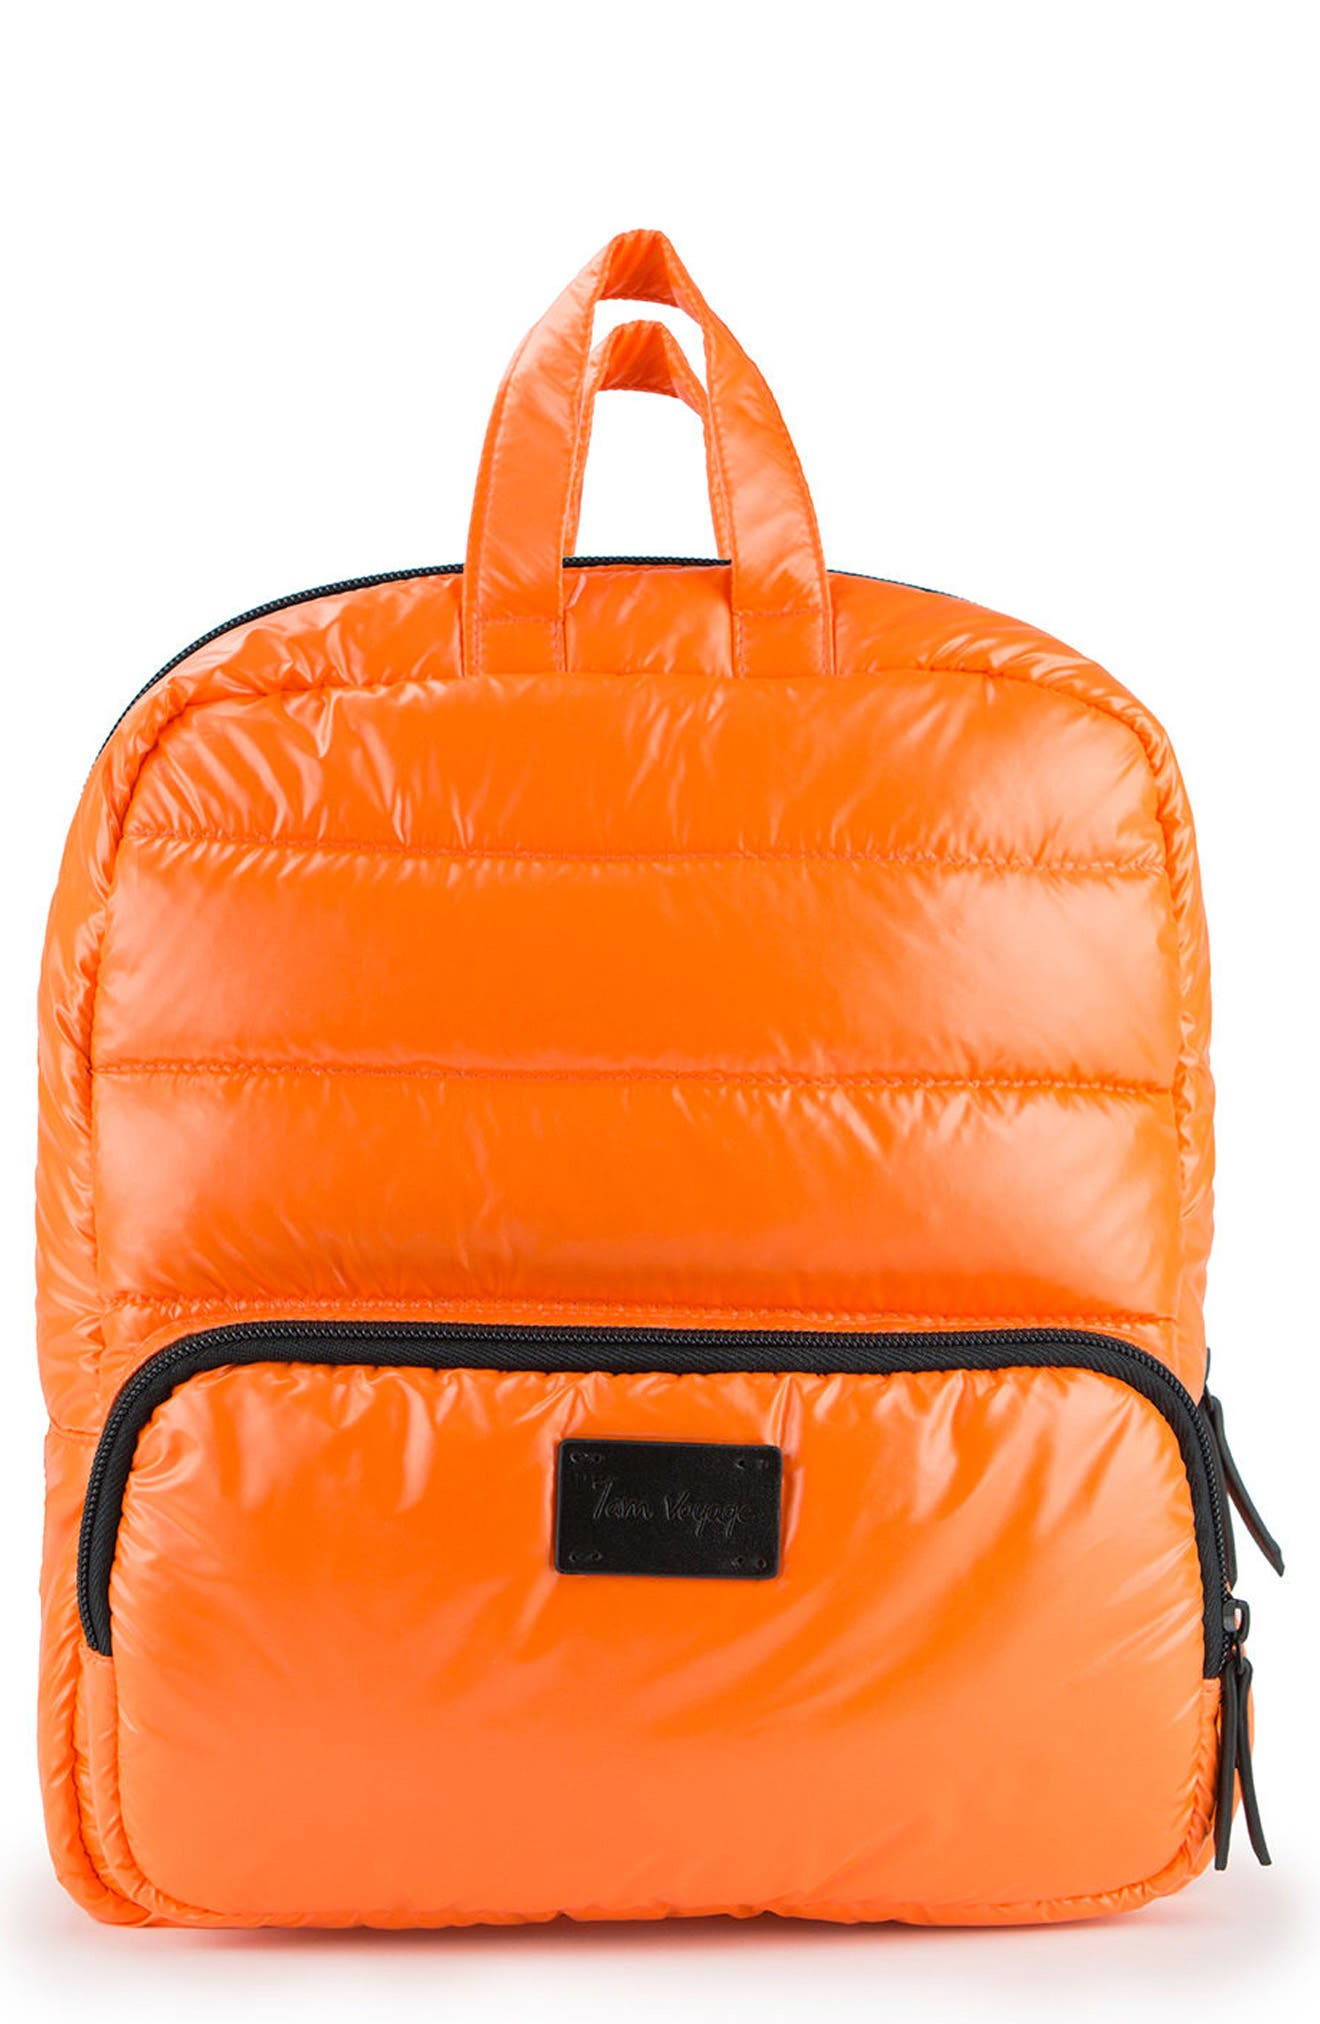 Mini Water Repellent Backpack,                             Main thumbnail 1, color,                             Tangerine